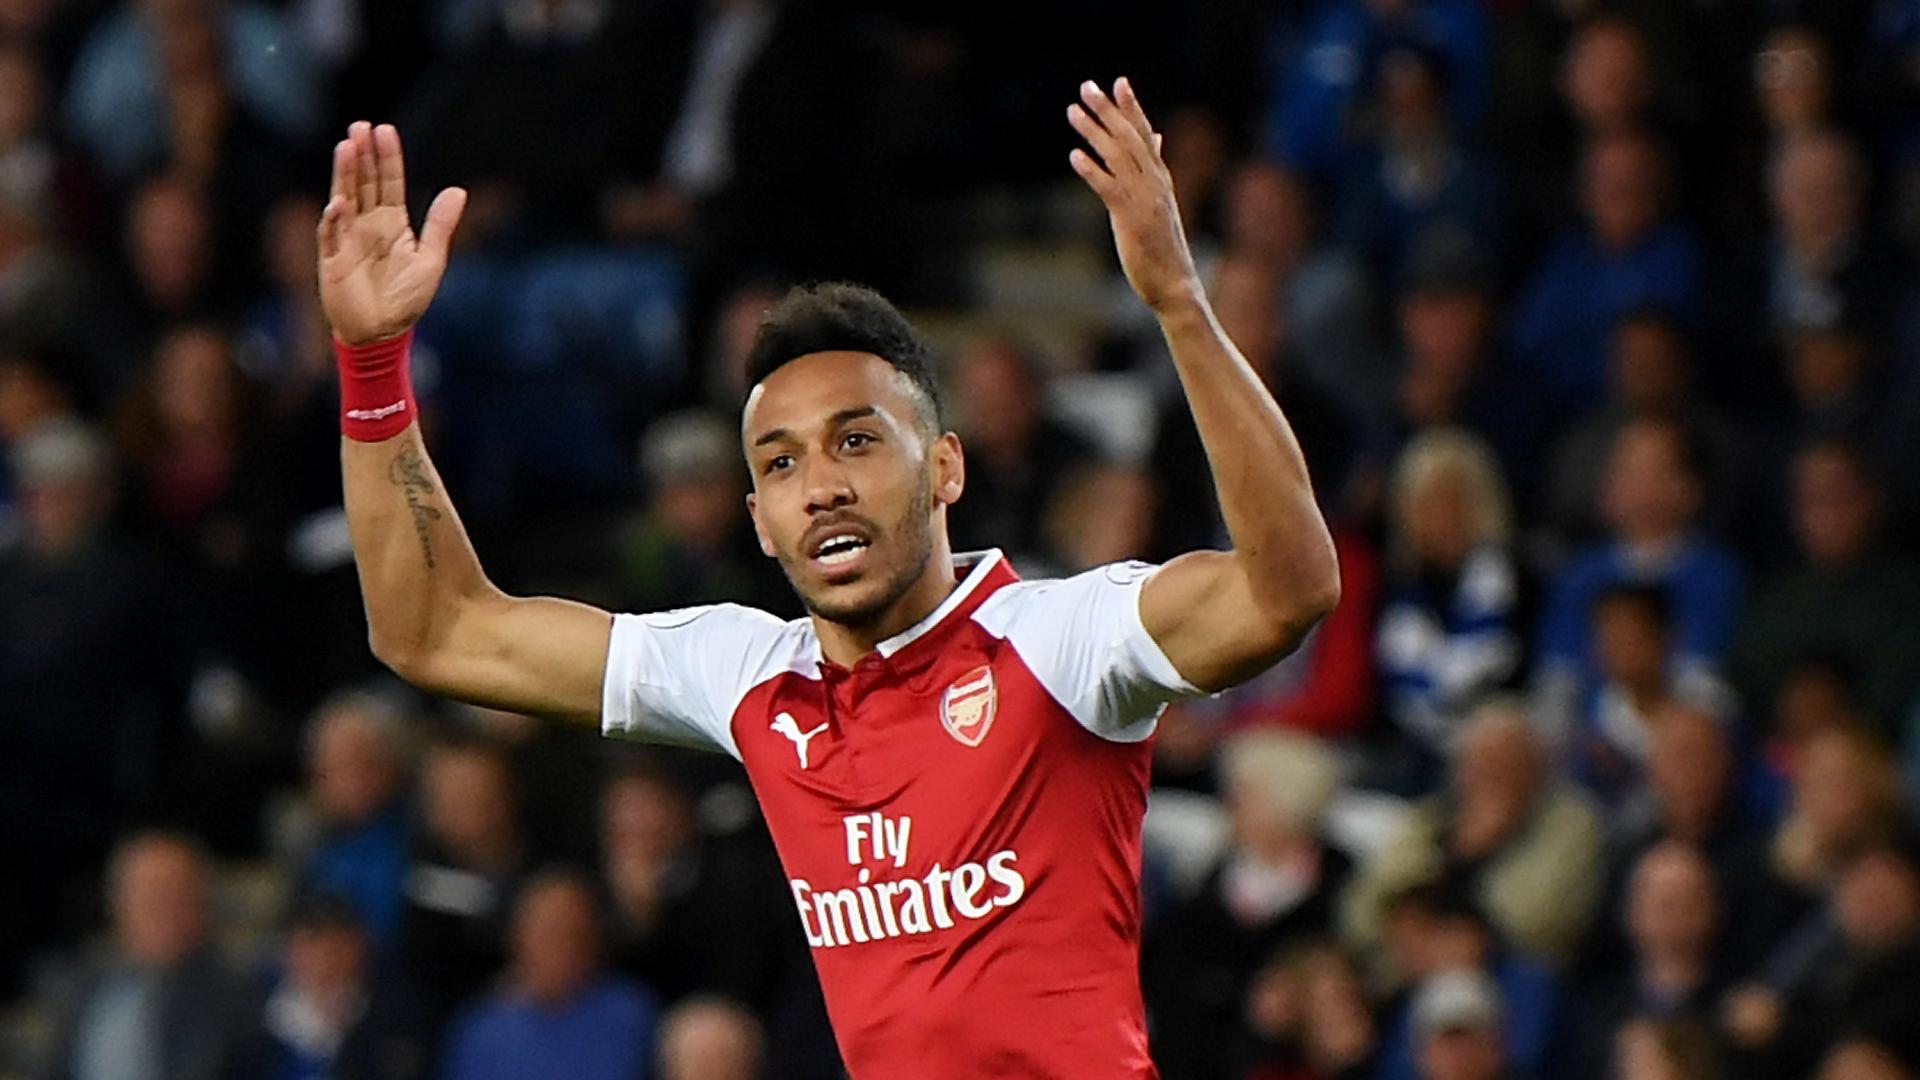 53ca8c07 Arsenal's away-day nightmare drags on but Auba & AMN give Gunners hope for  next season | Goal.com